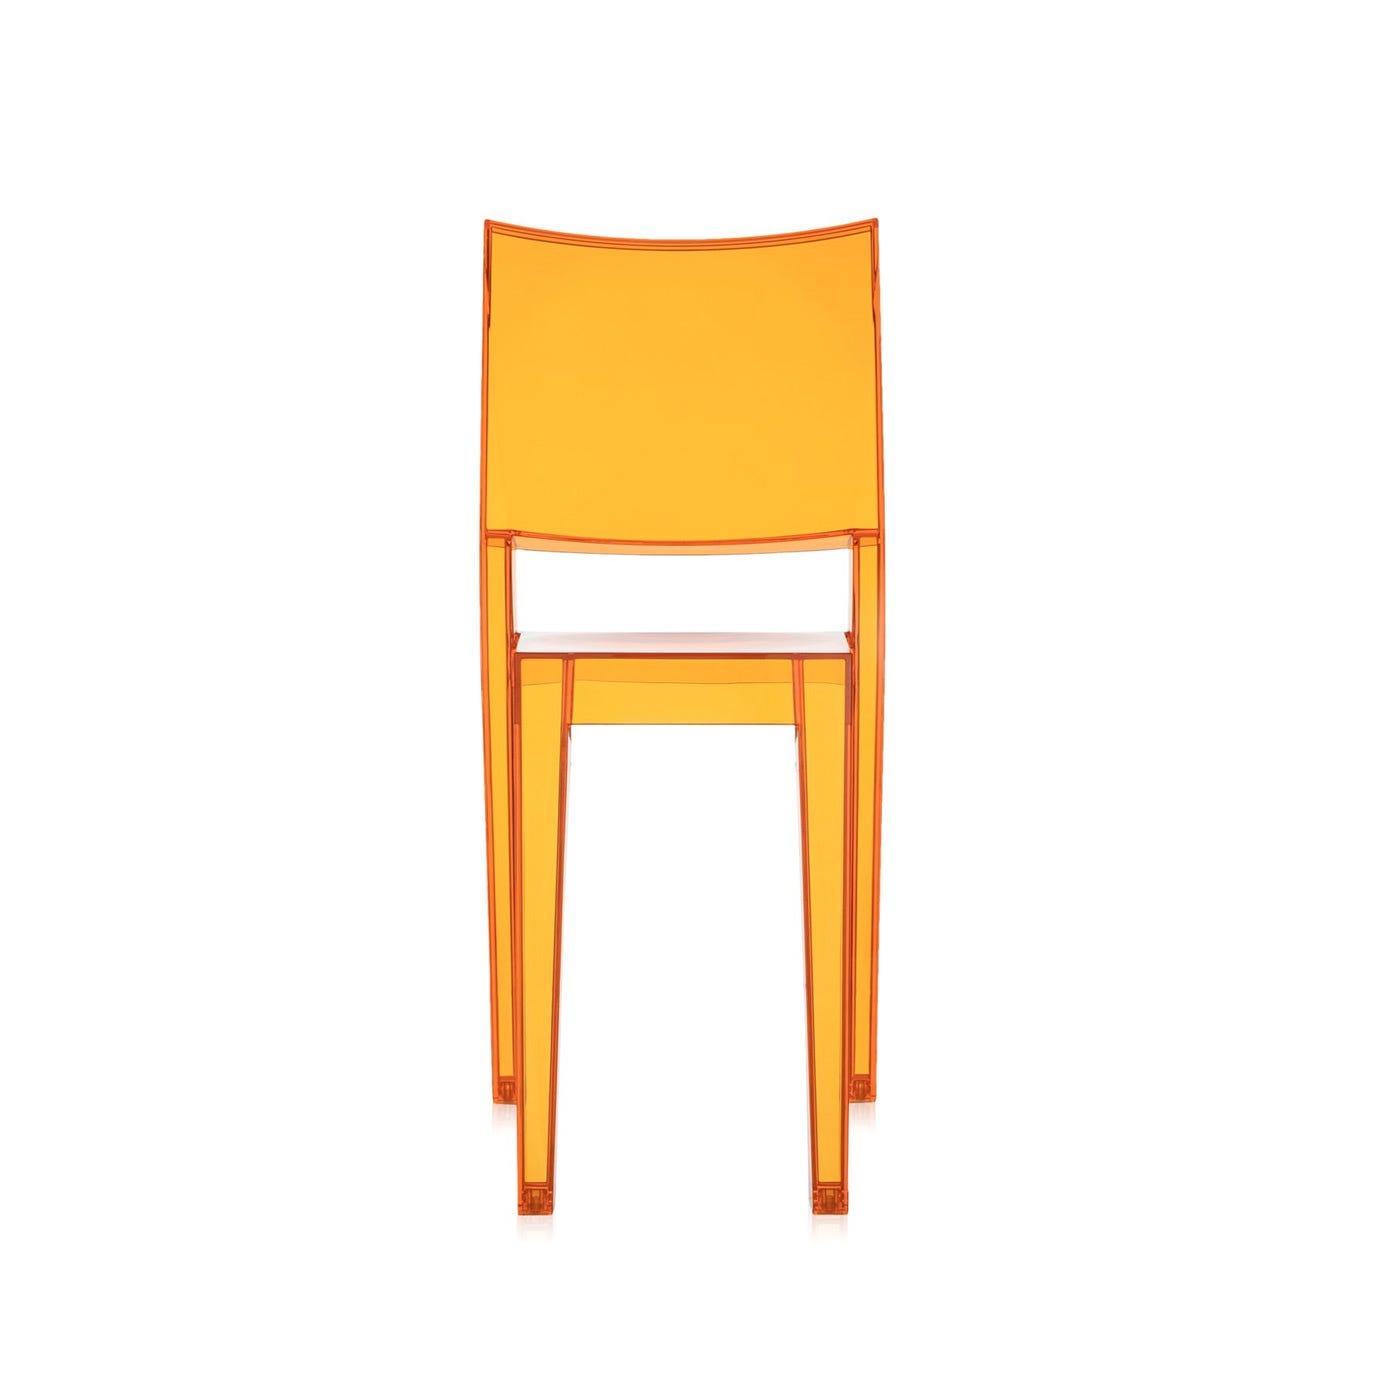 La Marie Chair Pinky Orange *Min 2 Chairs* - Discontinued